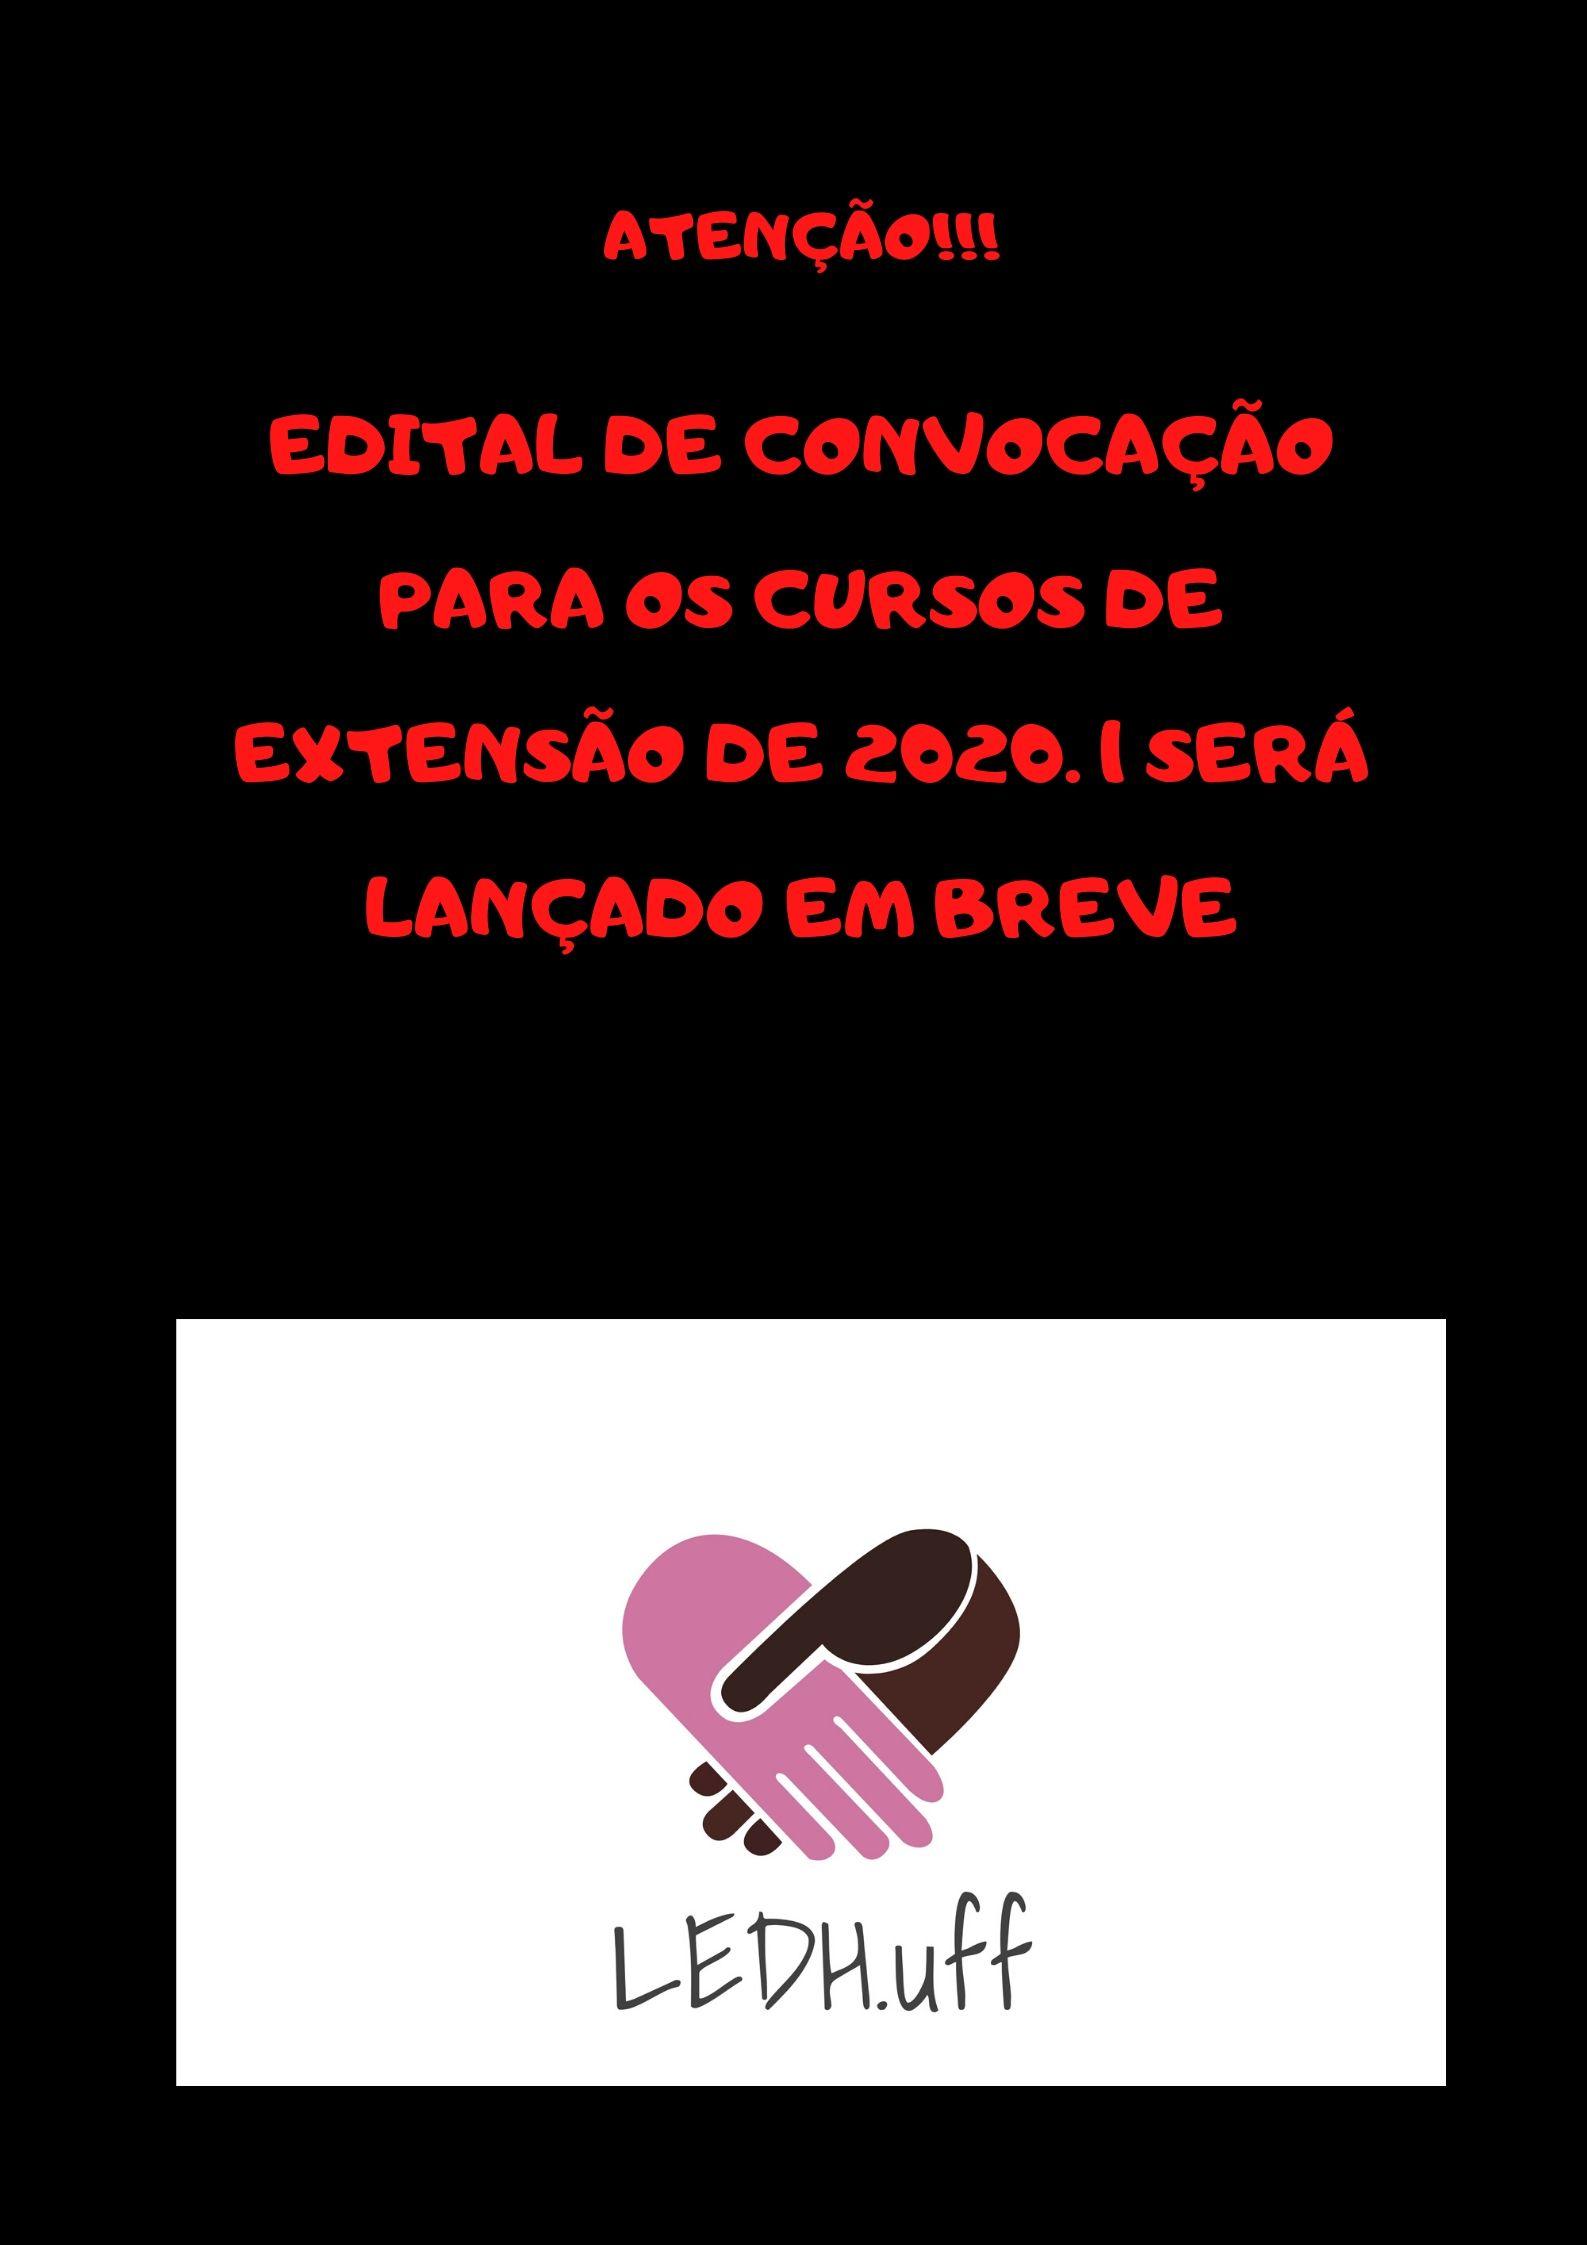 ALERTA EDIRAL 2020_1_LEDH